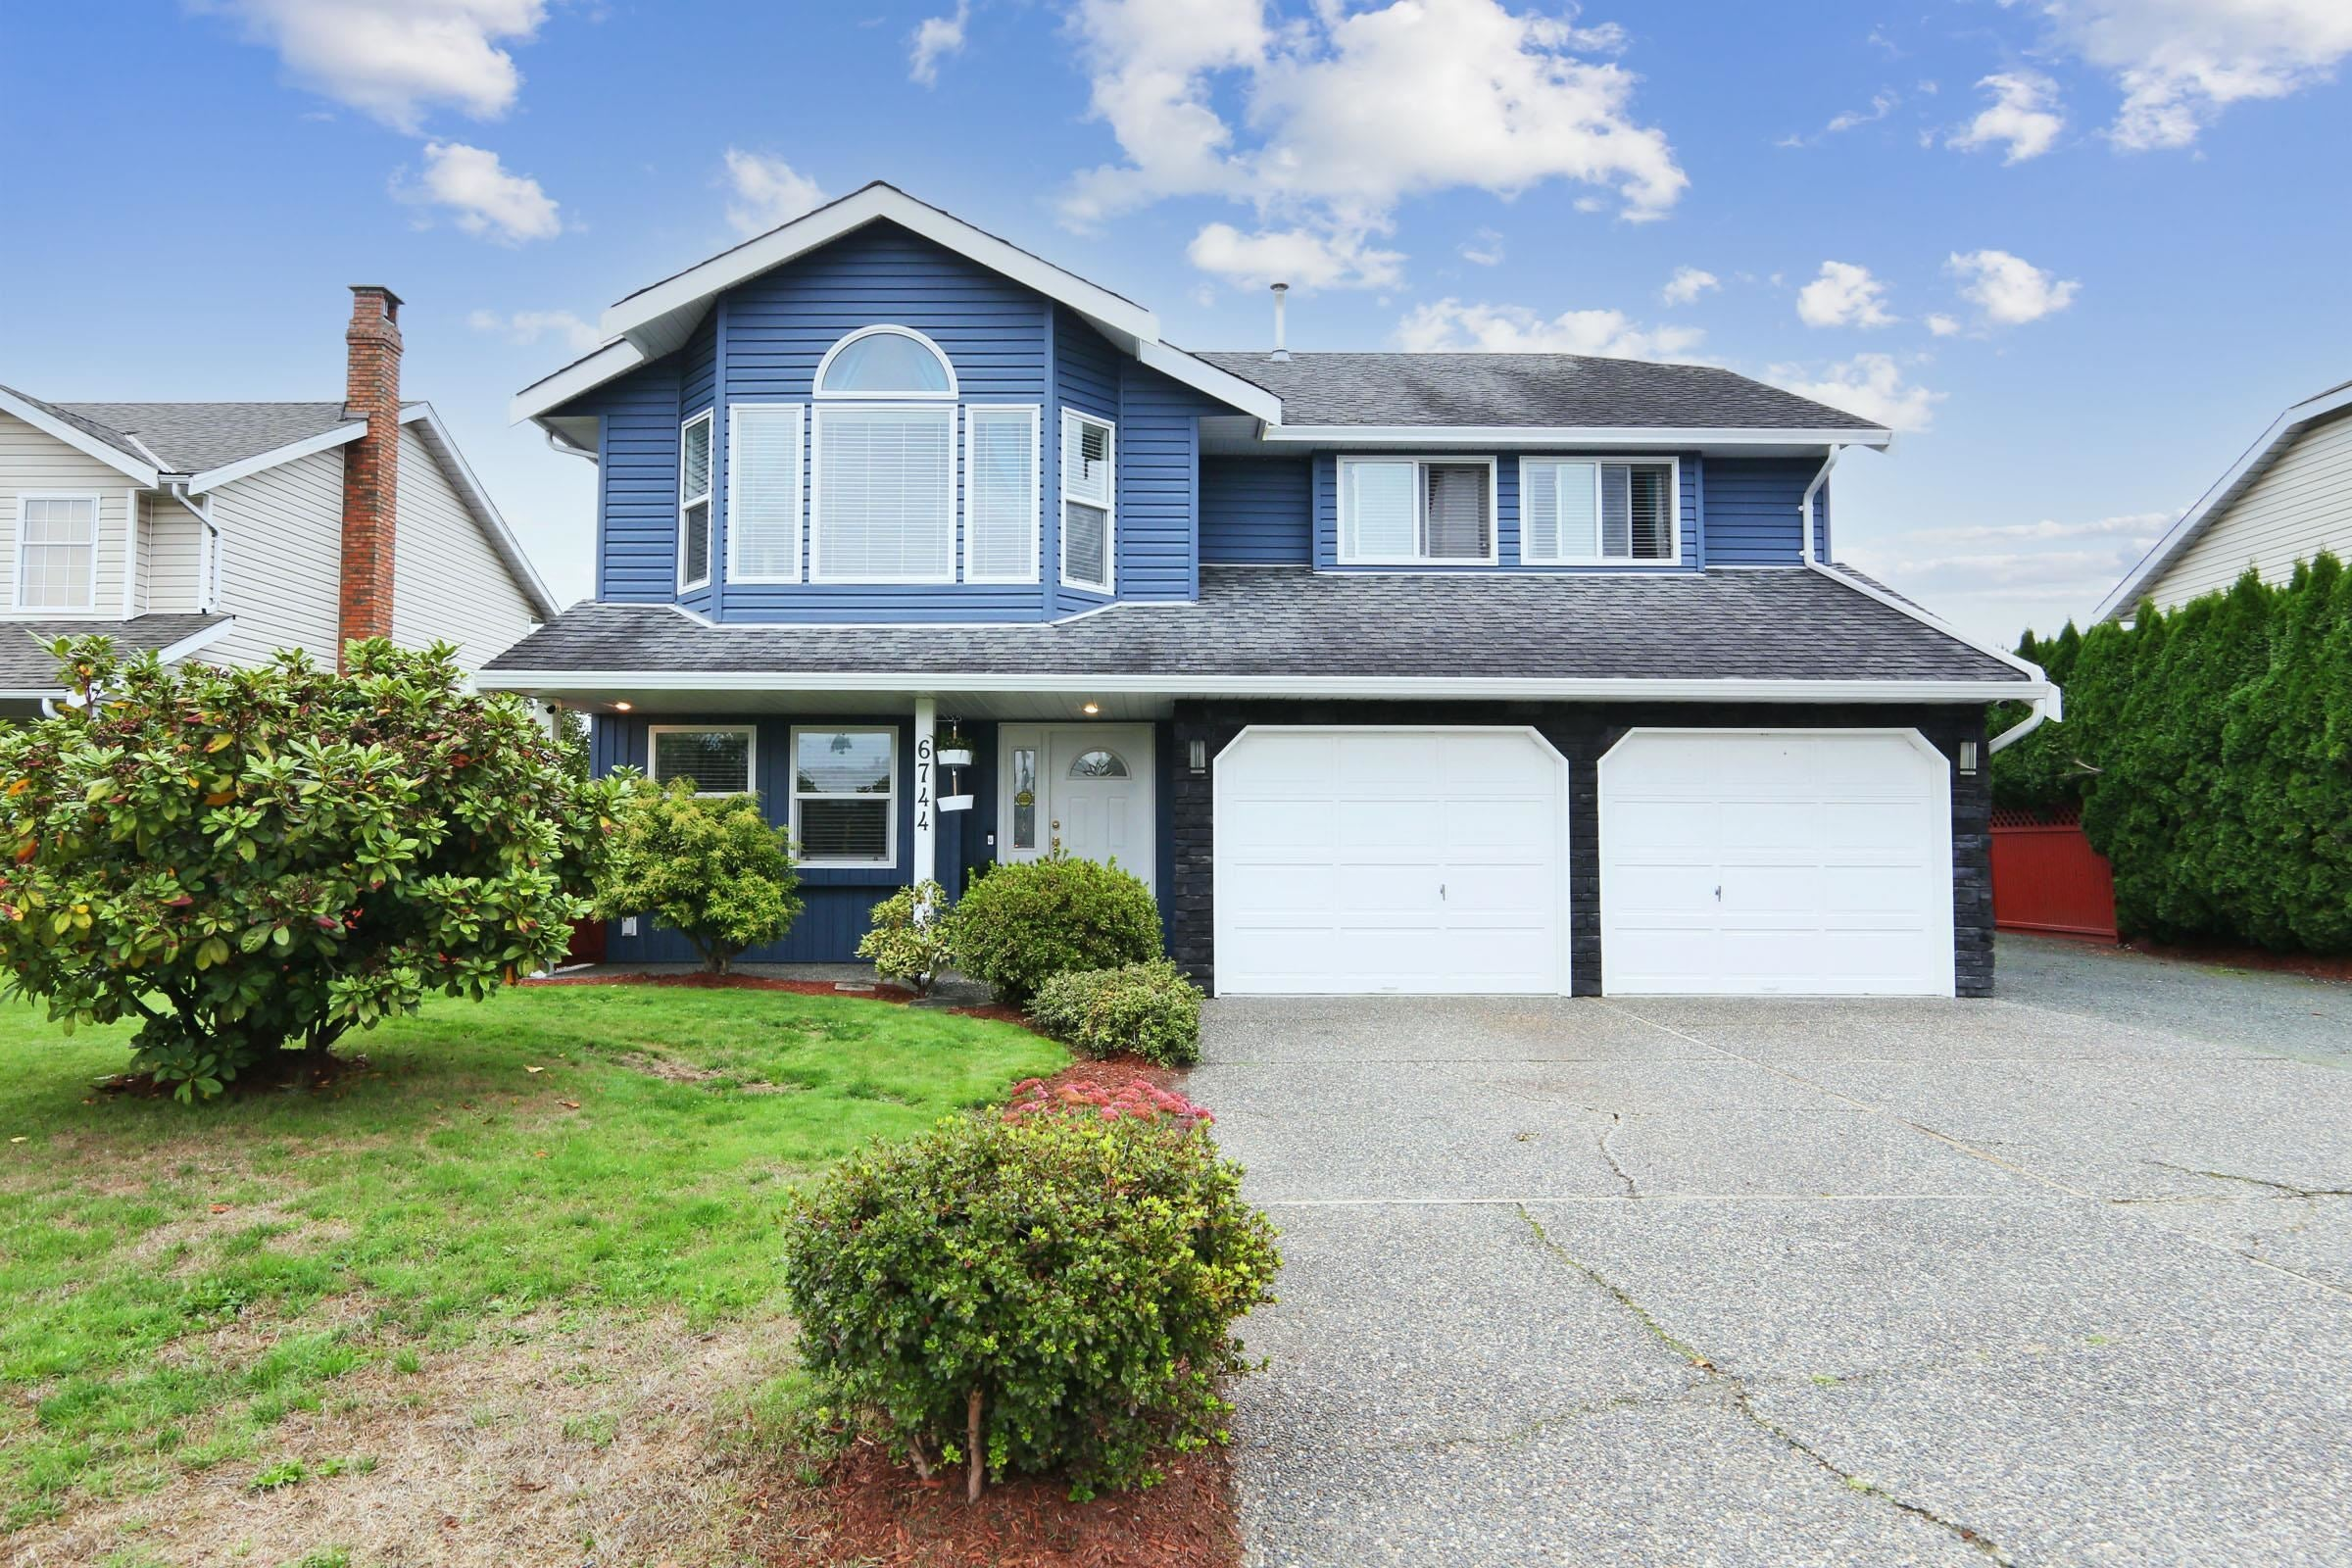 6744 VANMAR STREET - Sardis East Vedder Rd House/Single Family for sale, 4 Bedrooms (R2627057) - #1